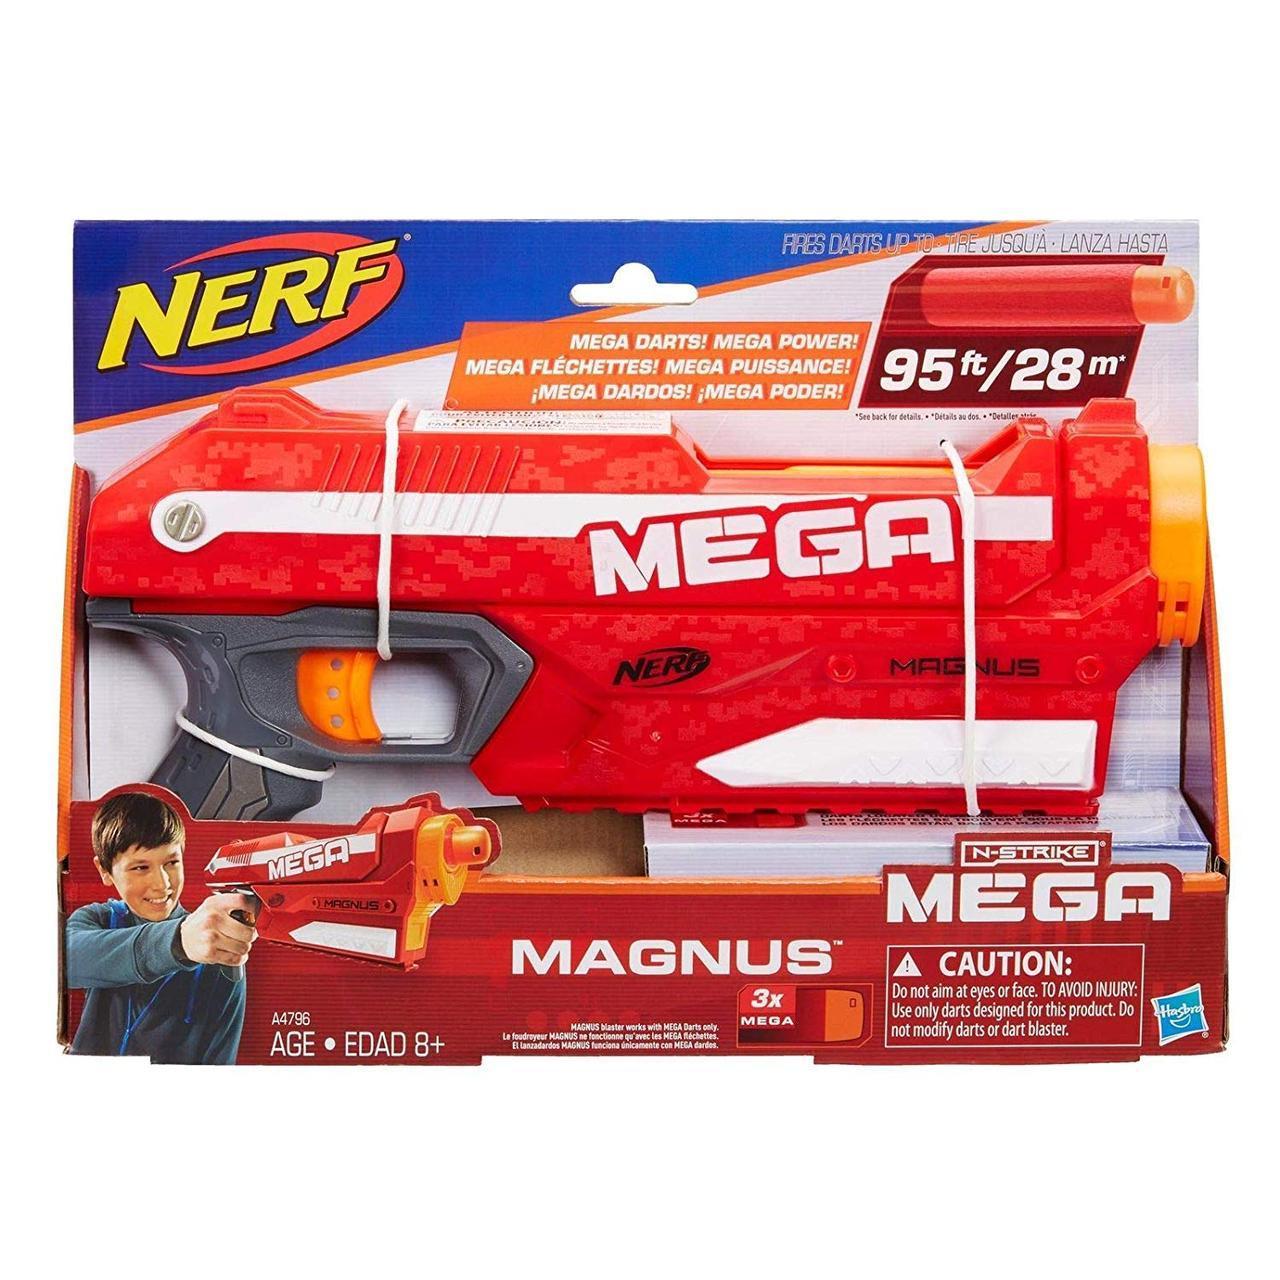 Бластер с мягкми пулями Магнус - Magnus, Blaster, Mega, Nerf, Hasbro (A4887)